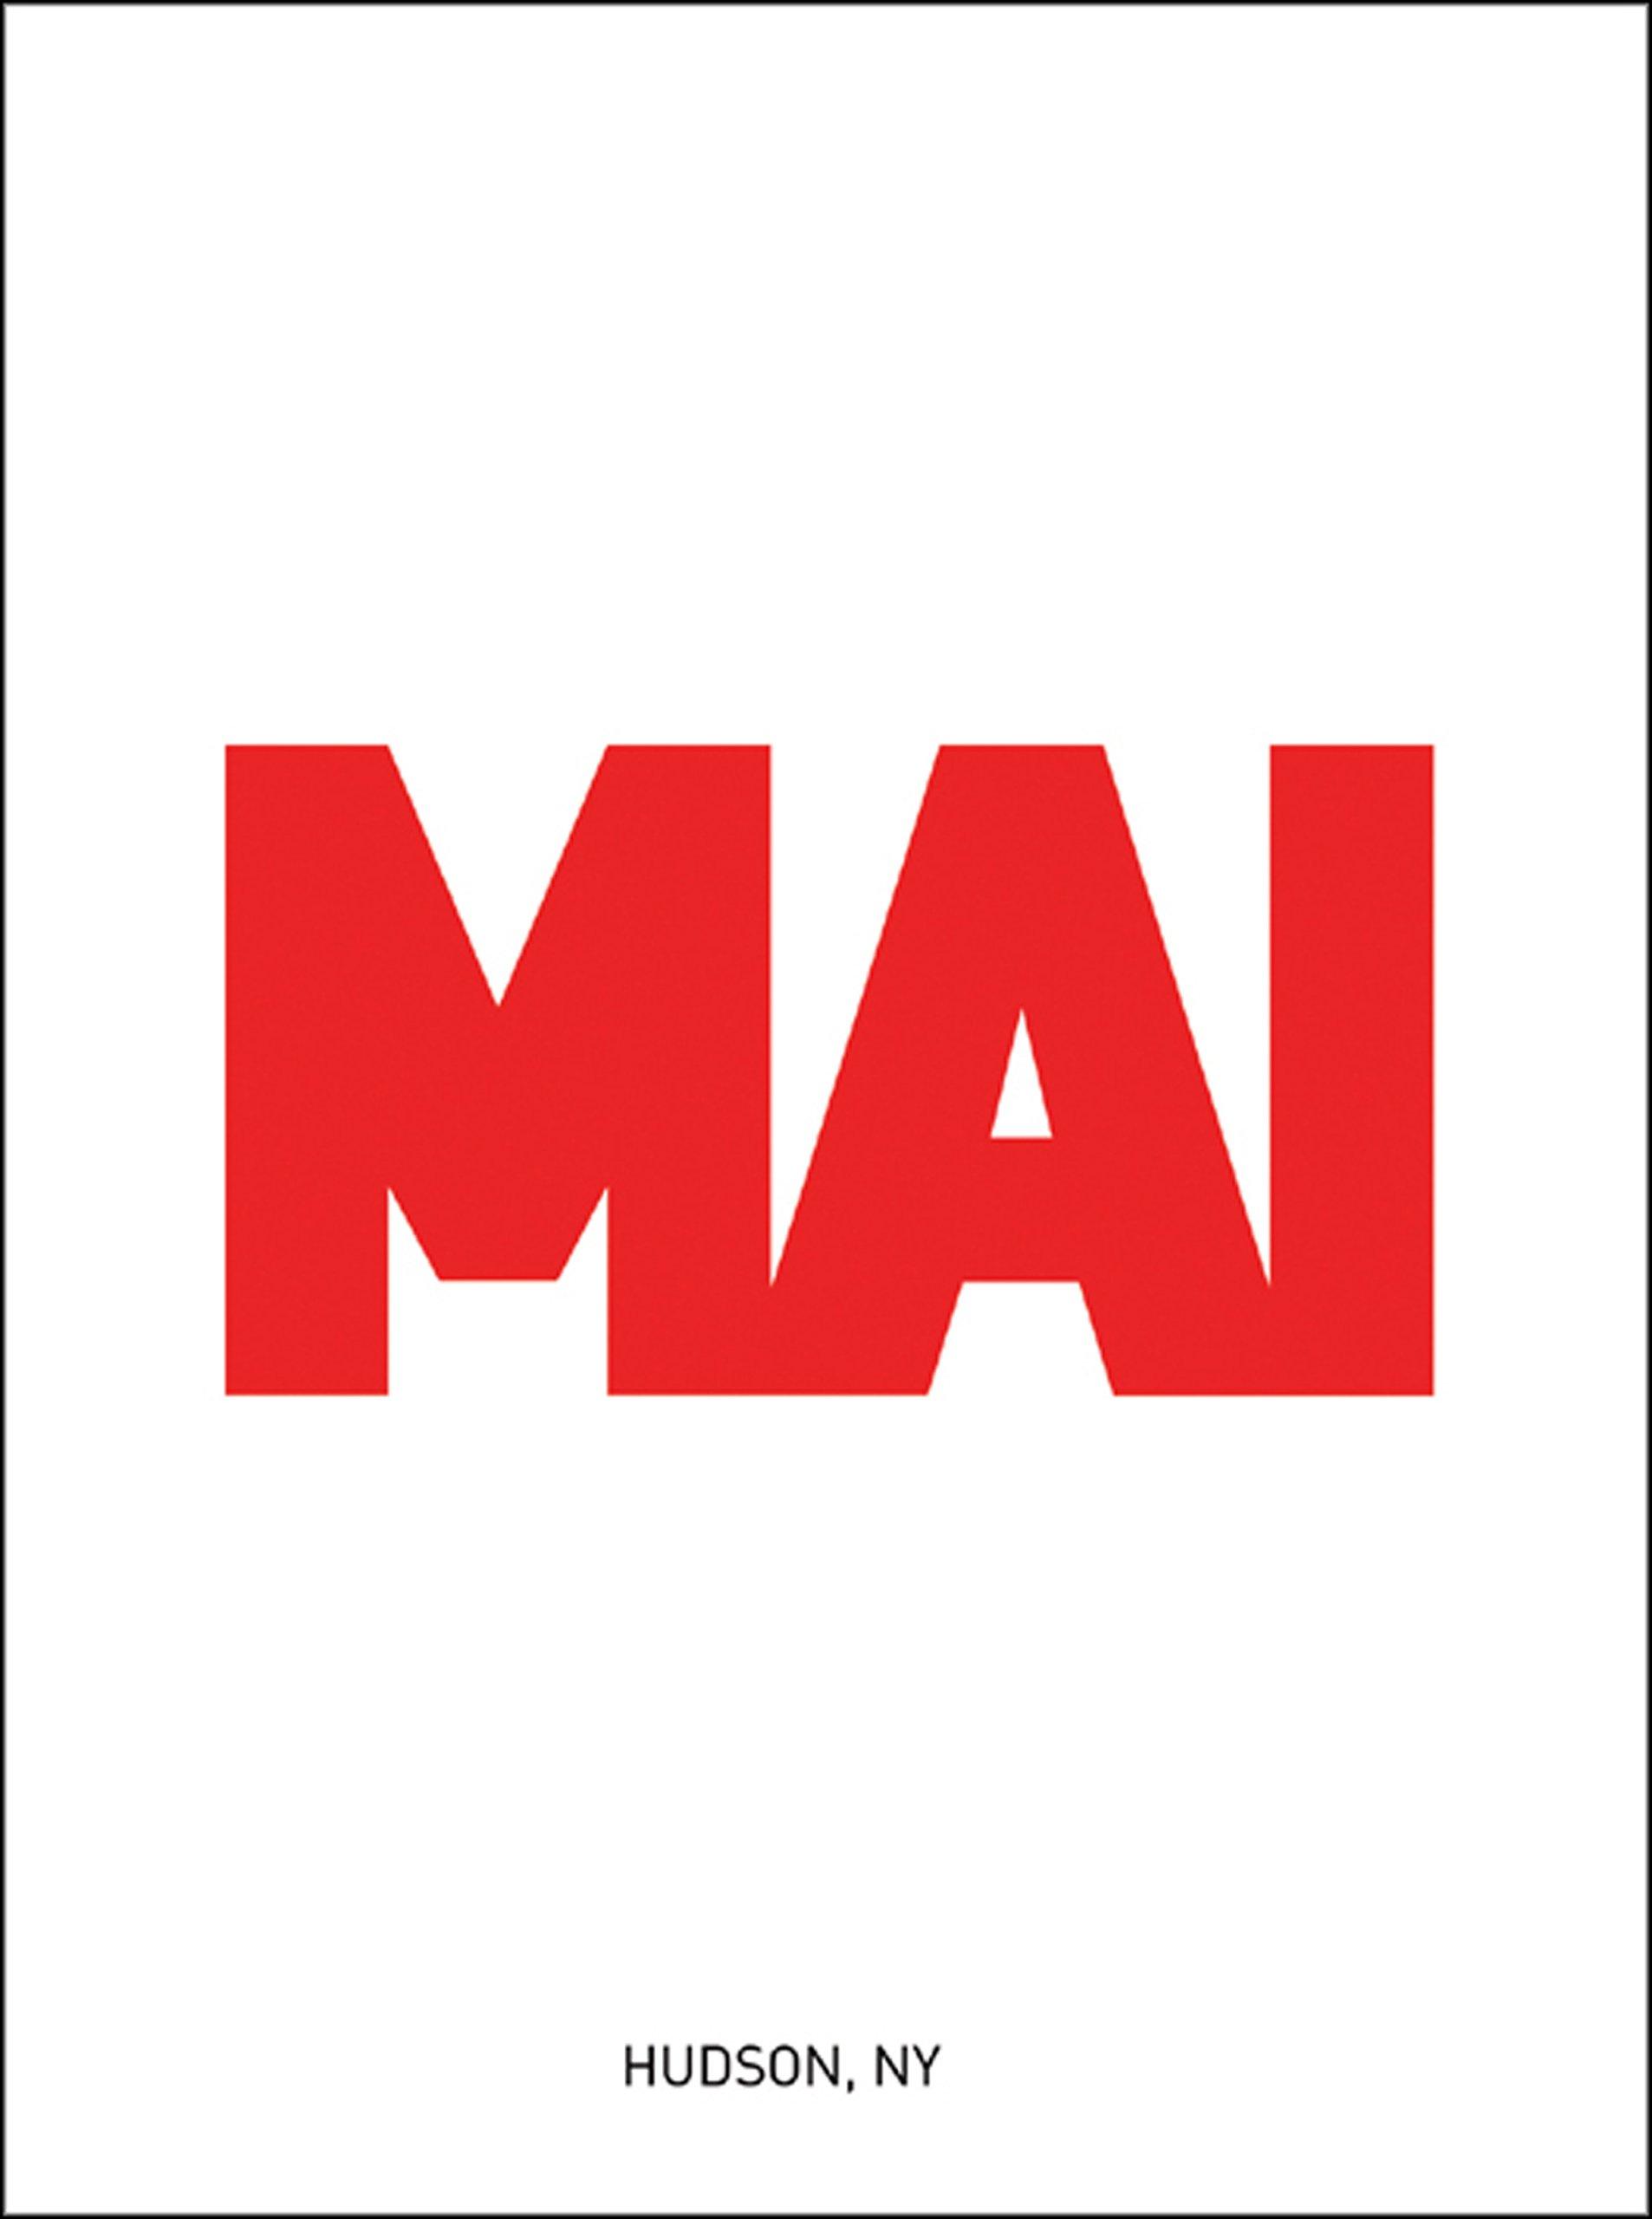 MAI. Marina Abramovic Institute. Ediz. inglese (Inglese) Copertina rigida – 12 dic 2013 24 Ore Cultura 8866481114 ARTI Arte figurativa